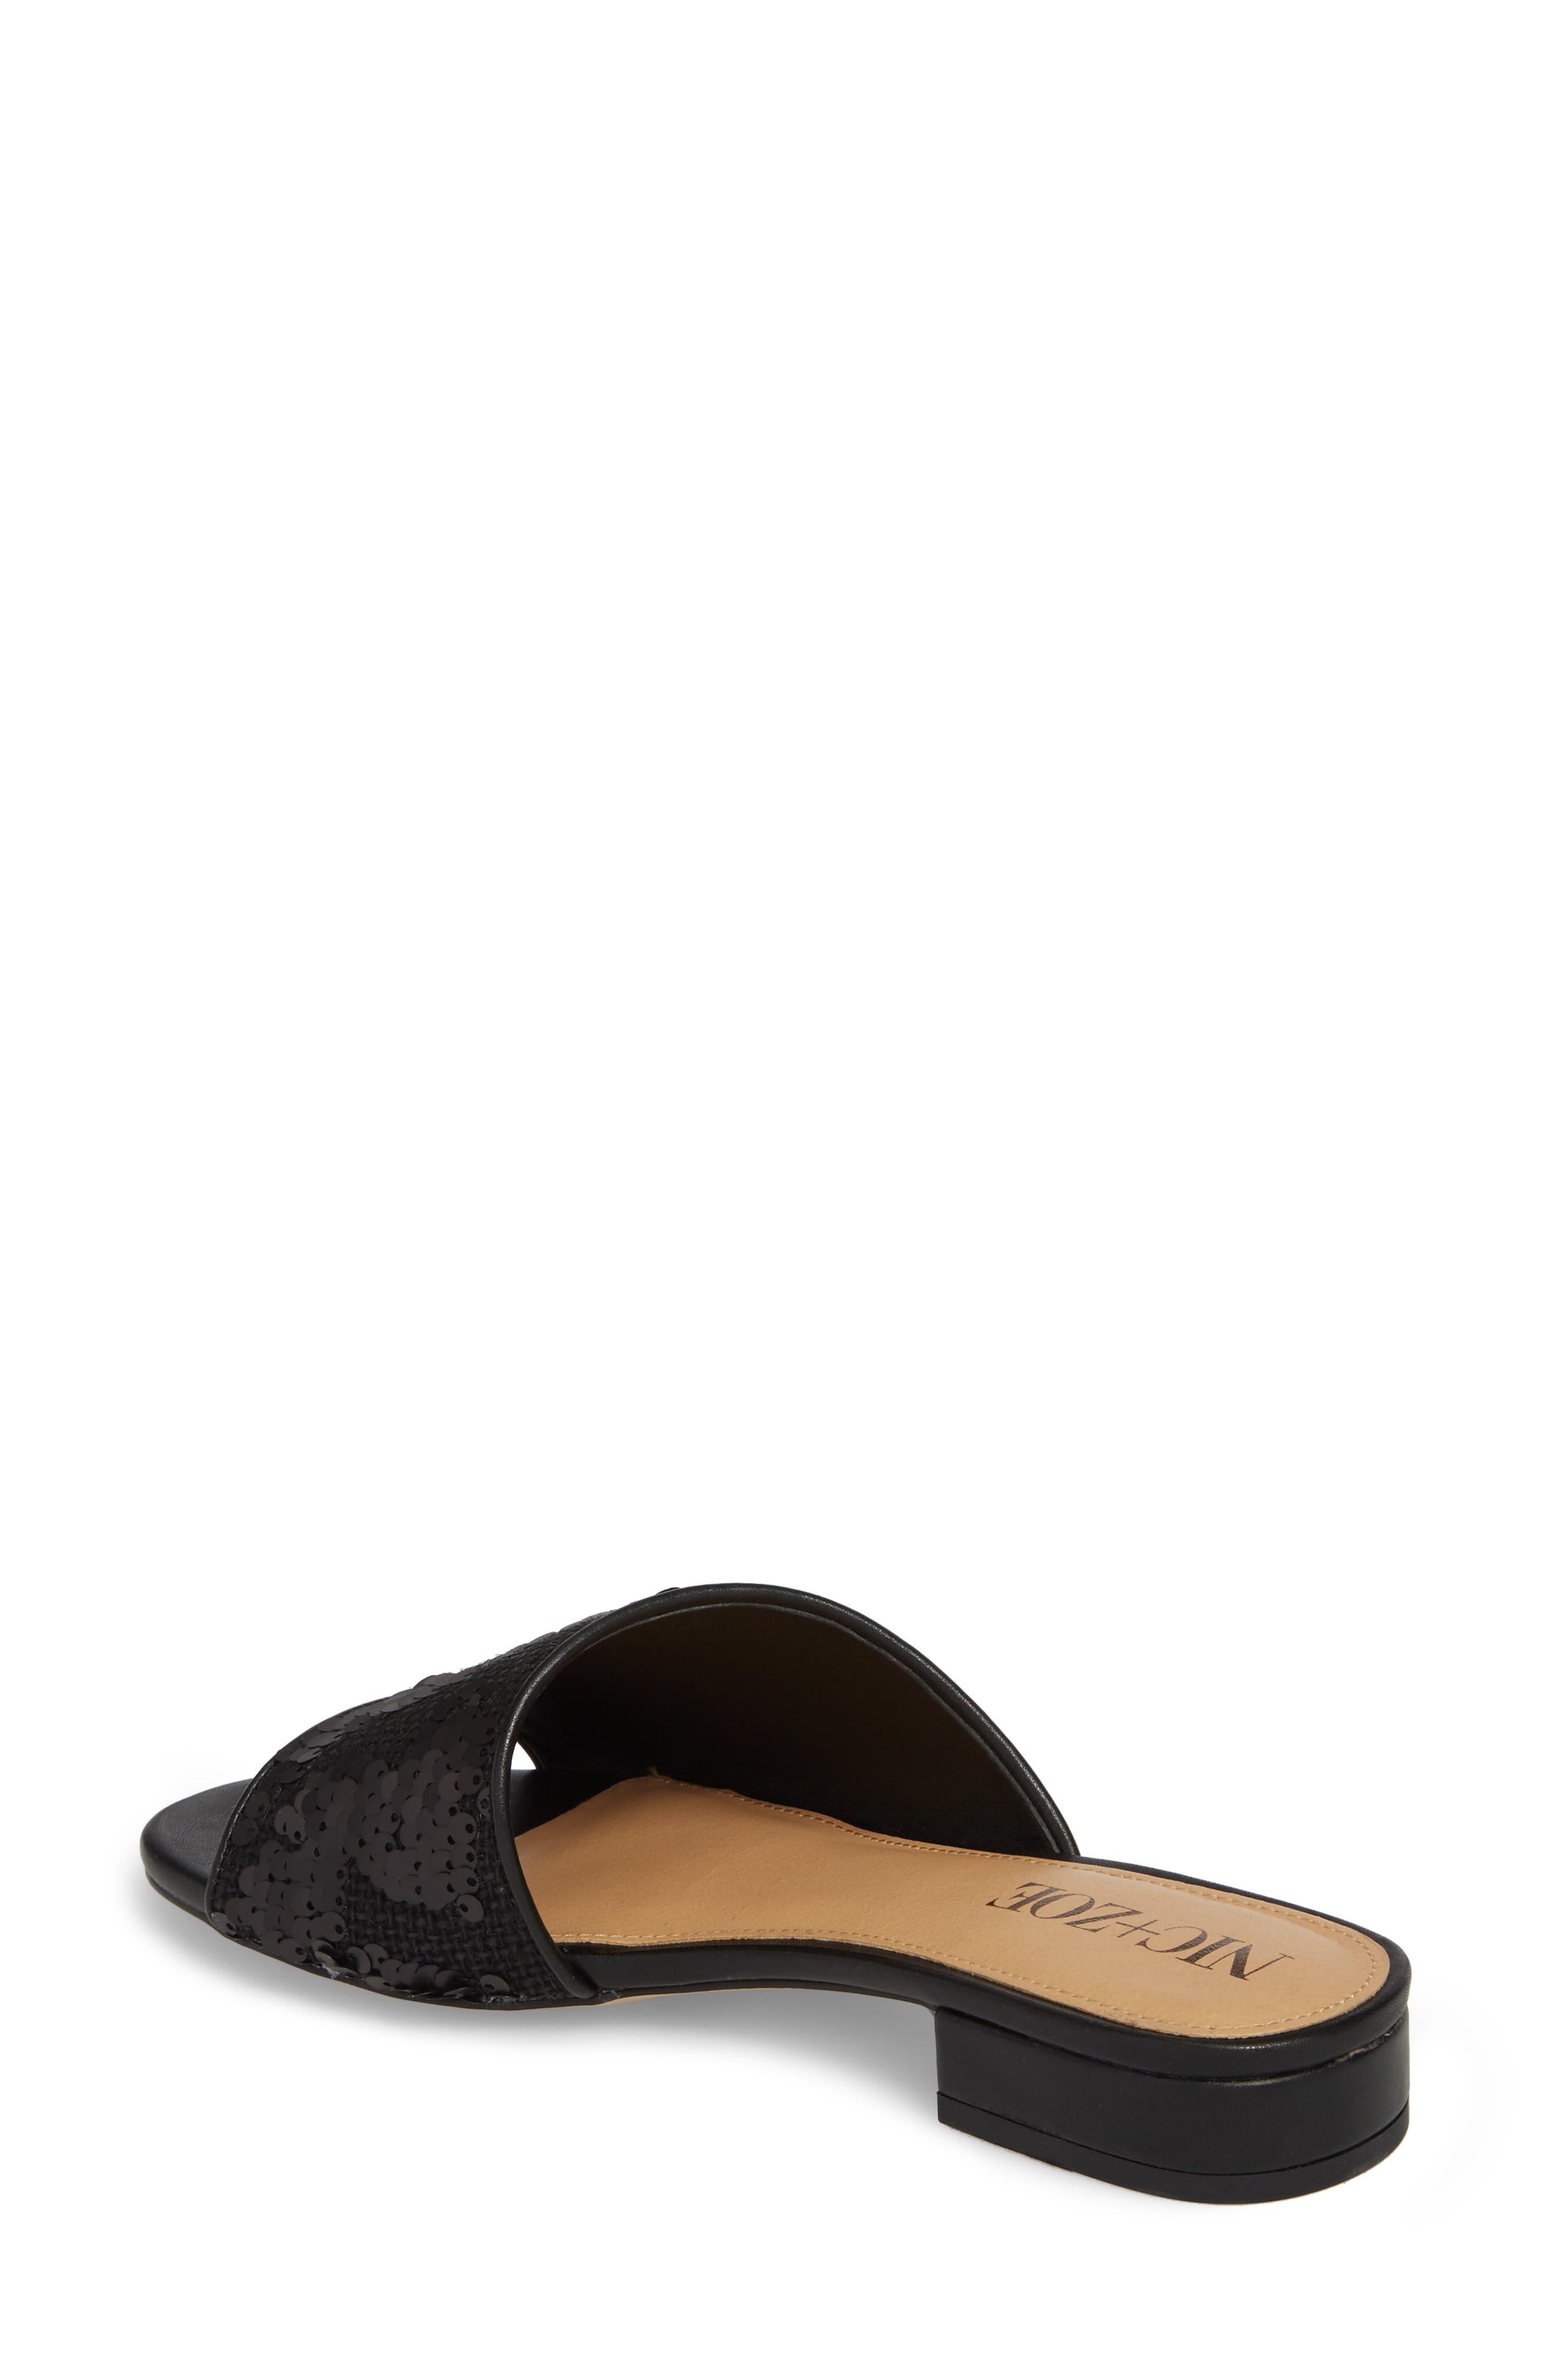 Stella Slide Sandal,                             Alternate thumbnail 2, color,                             Black Sequin Fabric